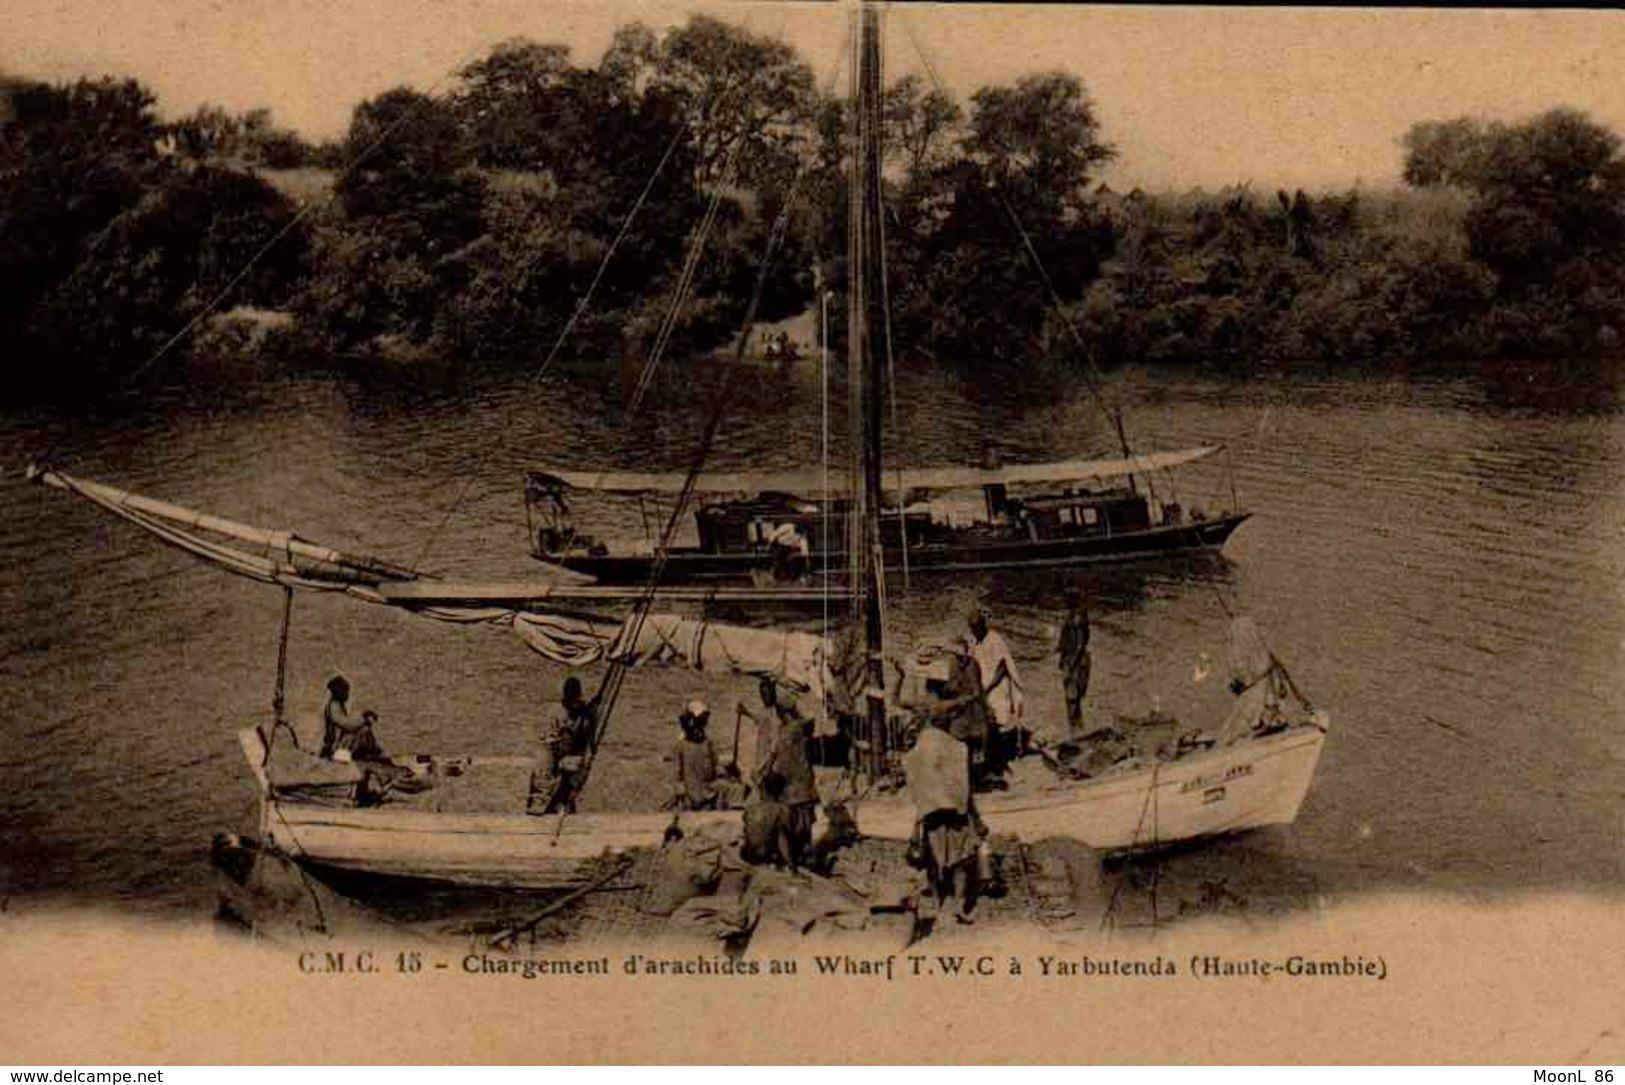 GAMBIE - Ancienne AFRIQUE OCCIDENTALE - CHARGEMENT D ARACHIDES AU WHARF T.W.C. A YARBUTENDA - Gambie